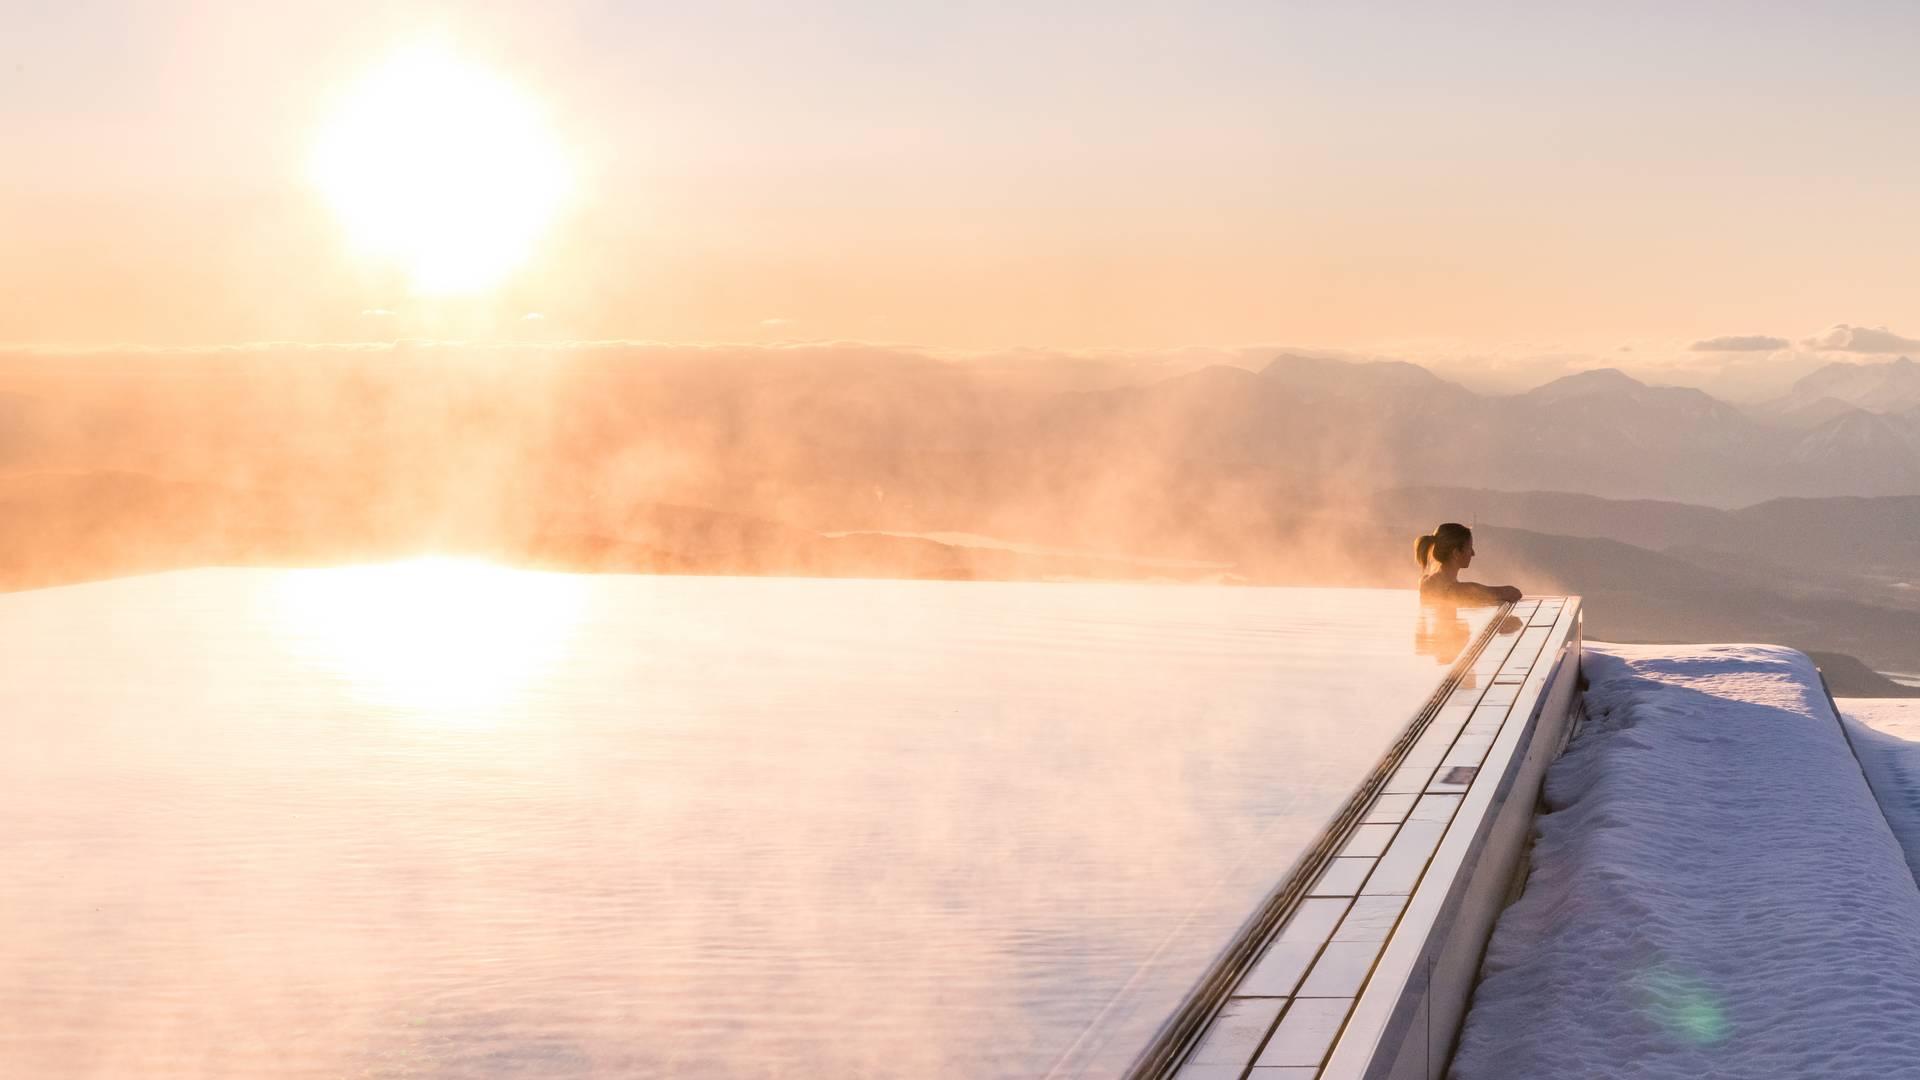 Mountain Resort Feuerberg_Im Infinitypool Winterpanorama genießen